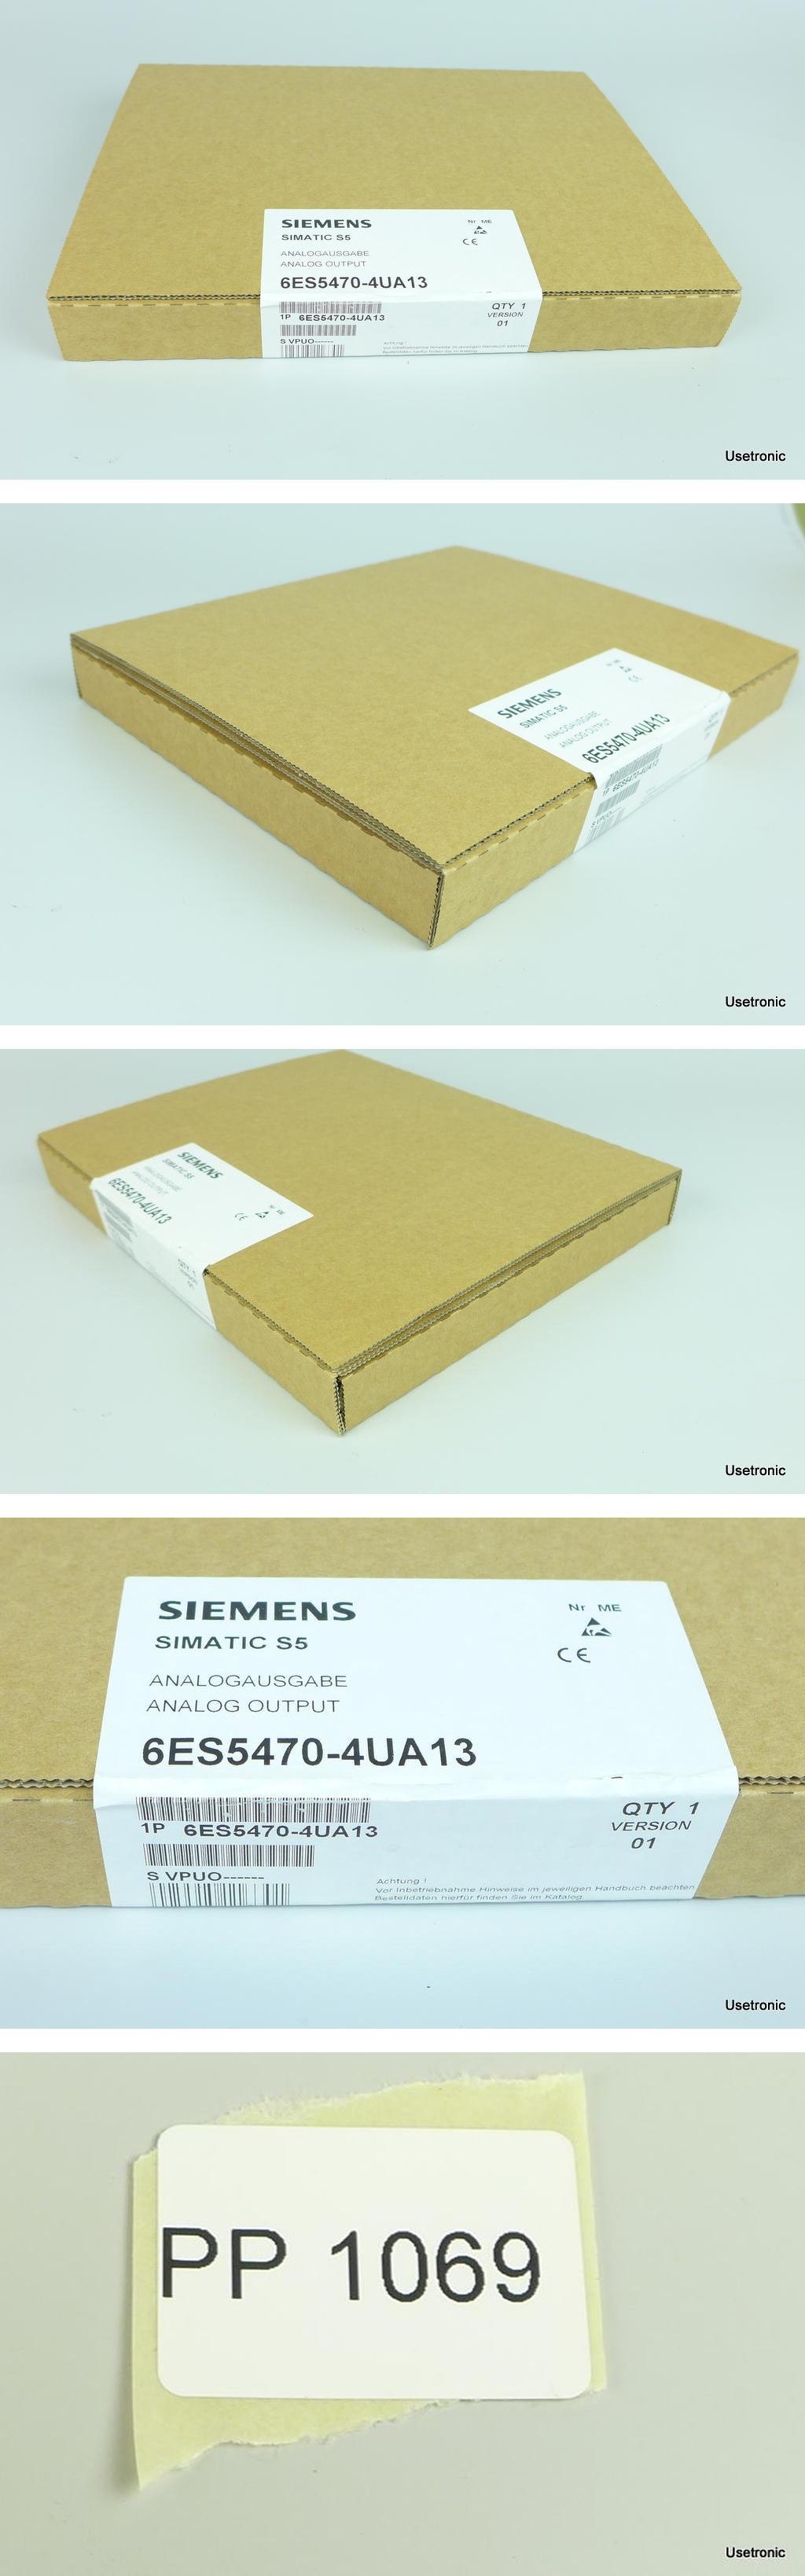 Siemens 6ES5470-4UA13